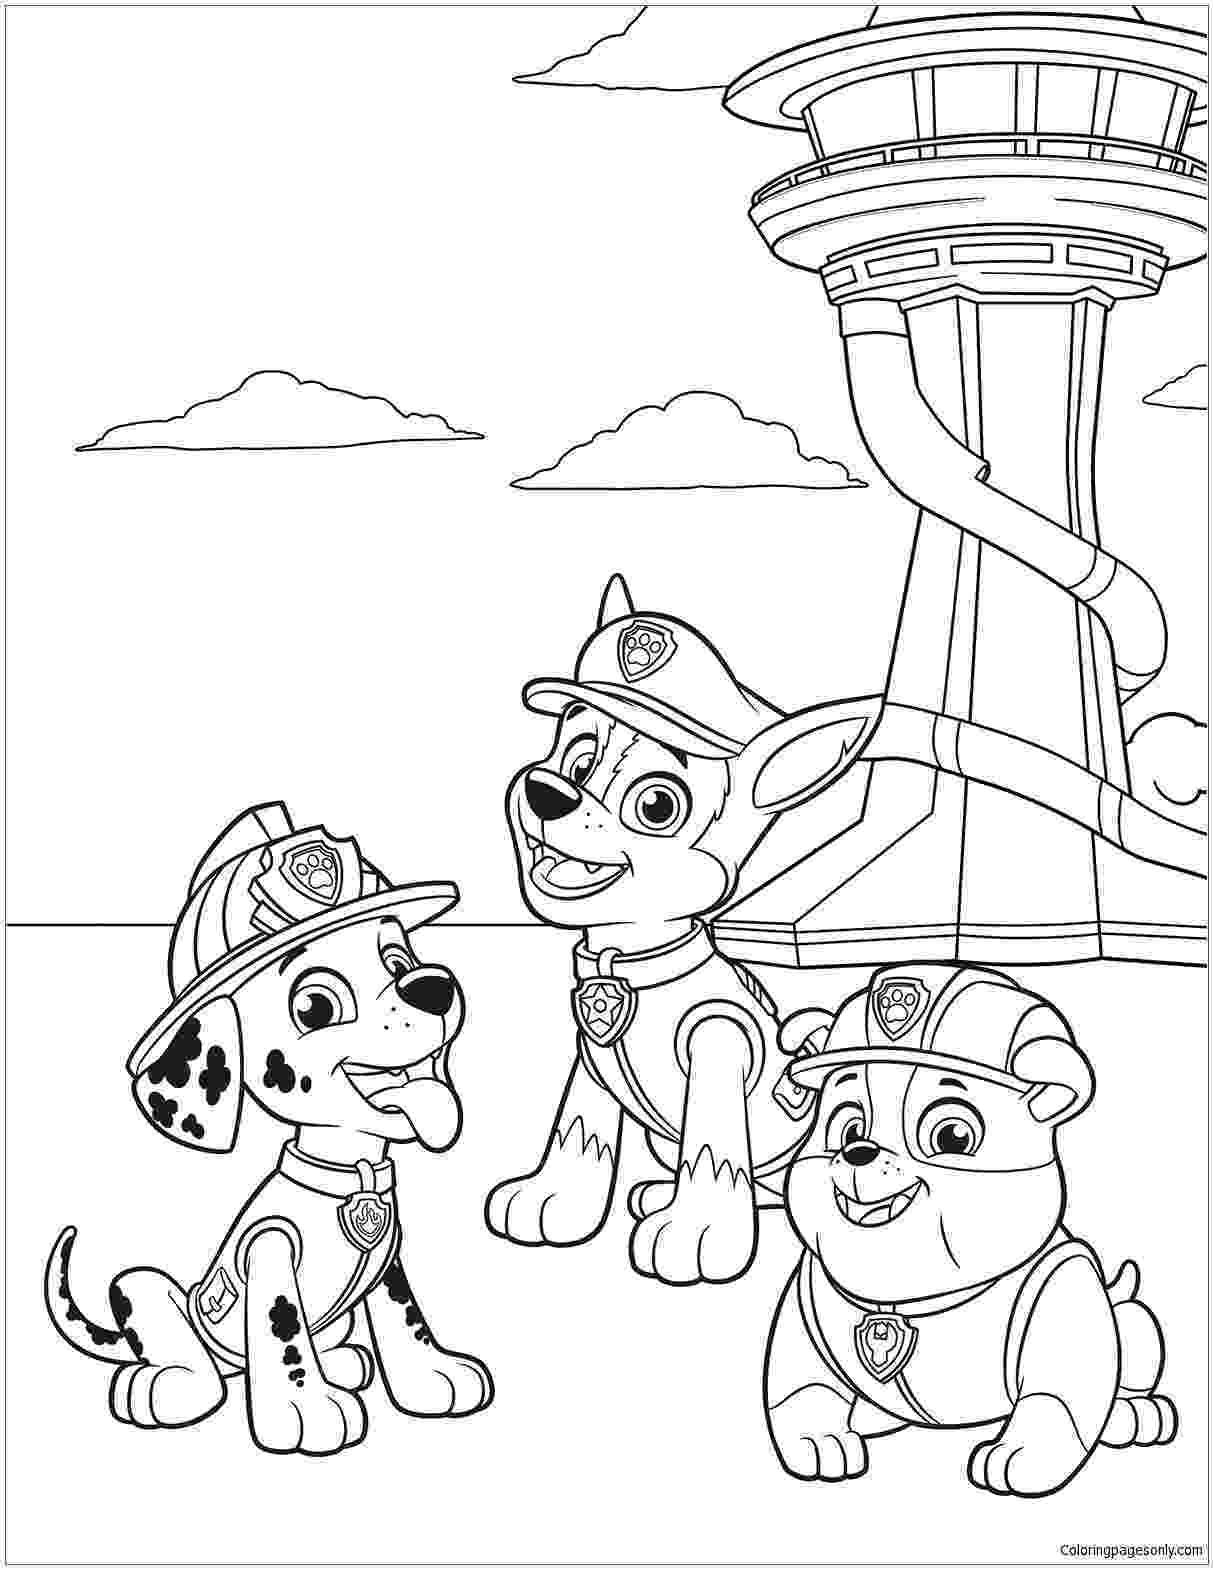 paw patrol coloring book paw patrol coloring pages best coloring pages for kids paw book patrol coloring